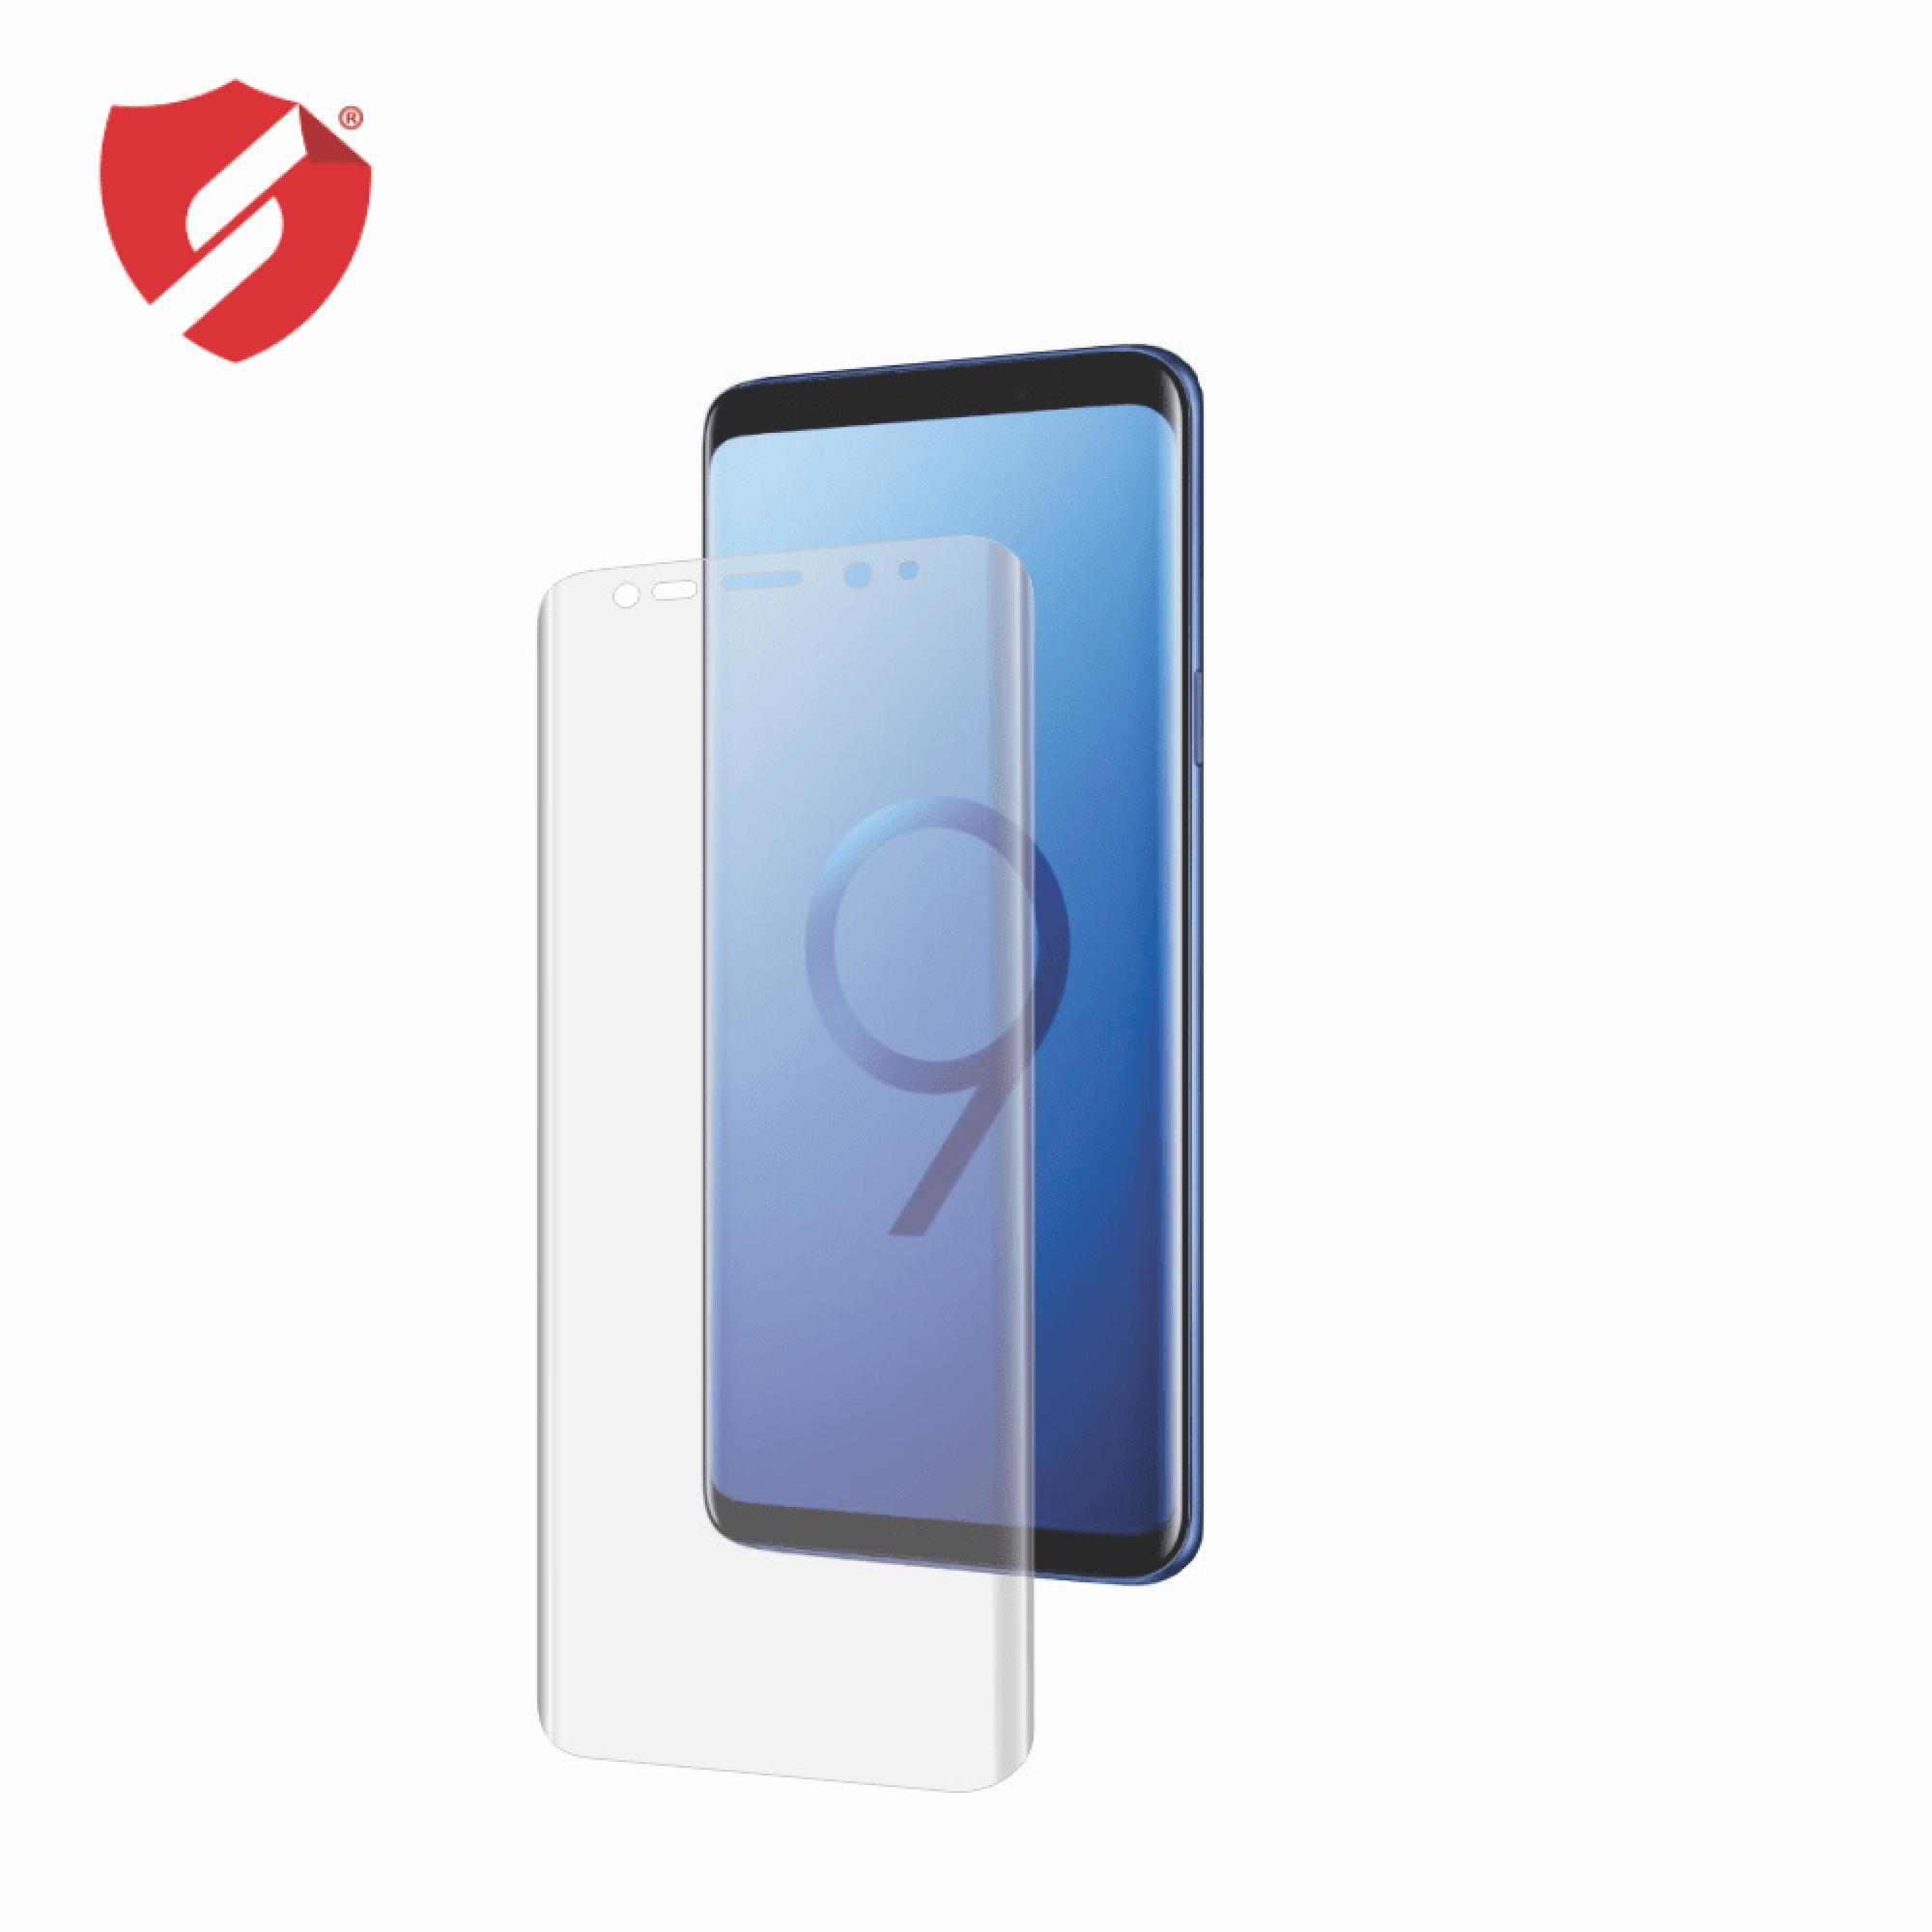 Folie de protectie Smart Protection Samsung Galaxy S9 compatibila cu carcasa Spigen Rugged Armor - doar-display imagine